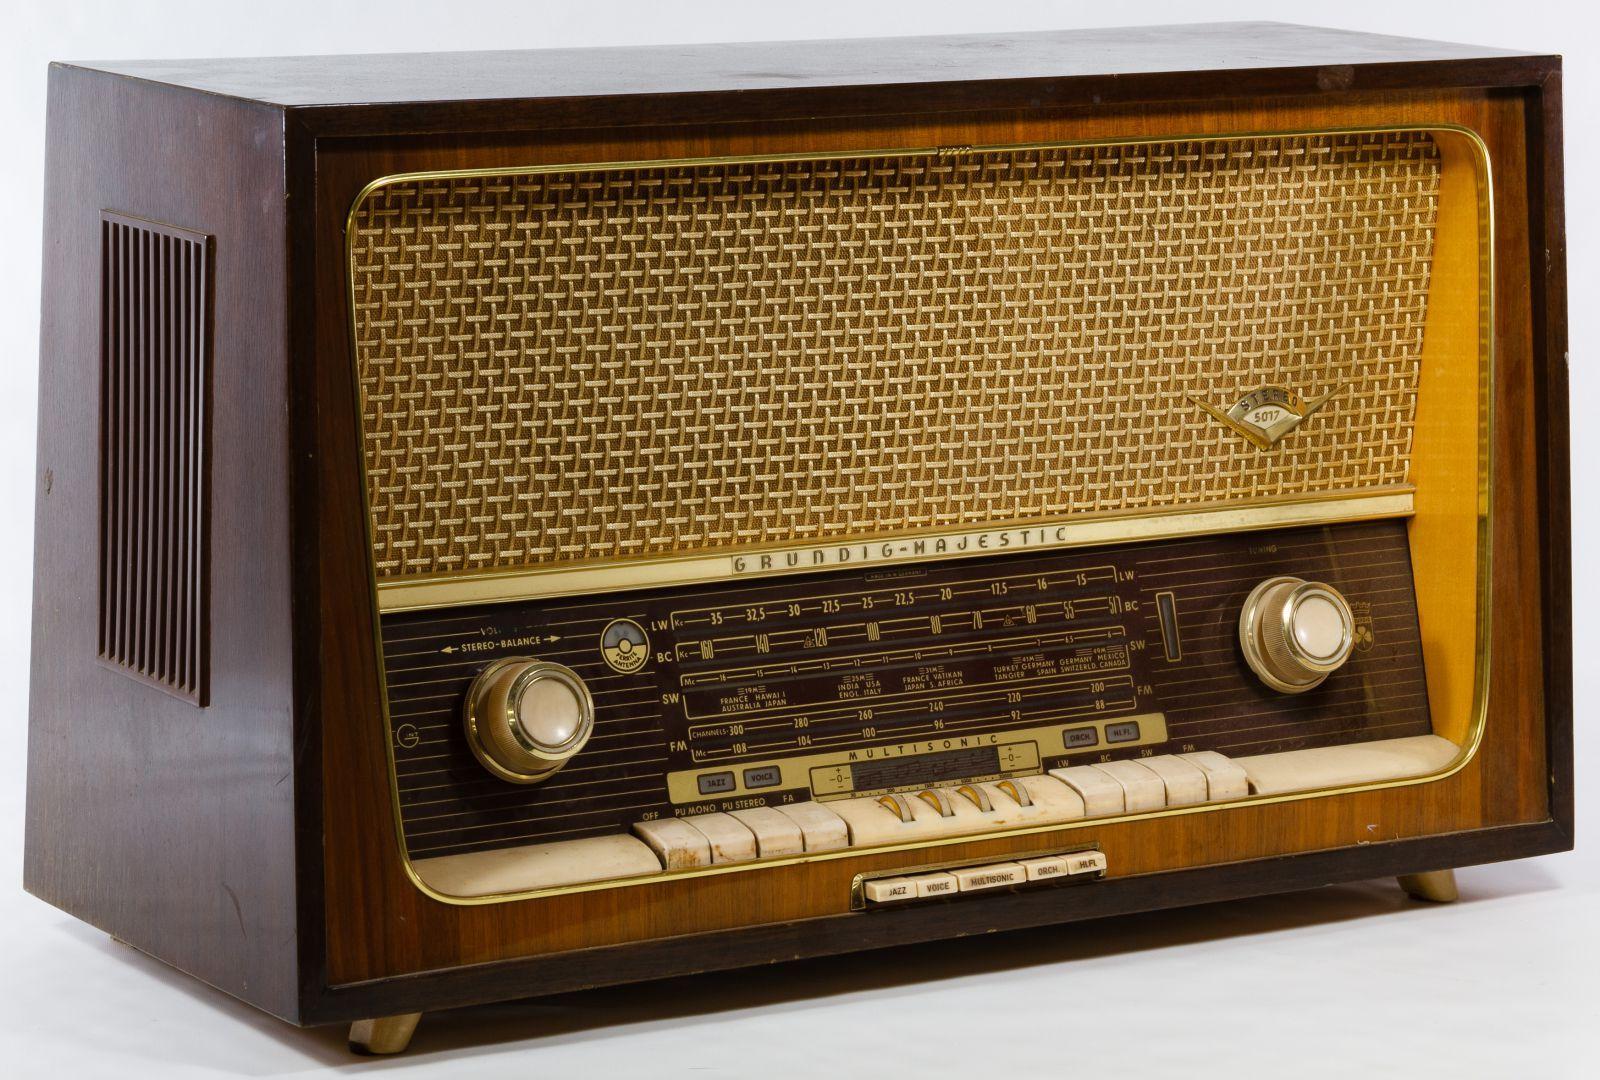 Lot 545 Grundig Majestic Multi Sonic Radio Model 5017u Having Am Fm And Short Wave Radio Tuners And A Mid Century Antique Radio Retro Radios Vintage Radio